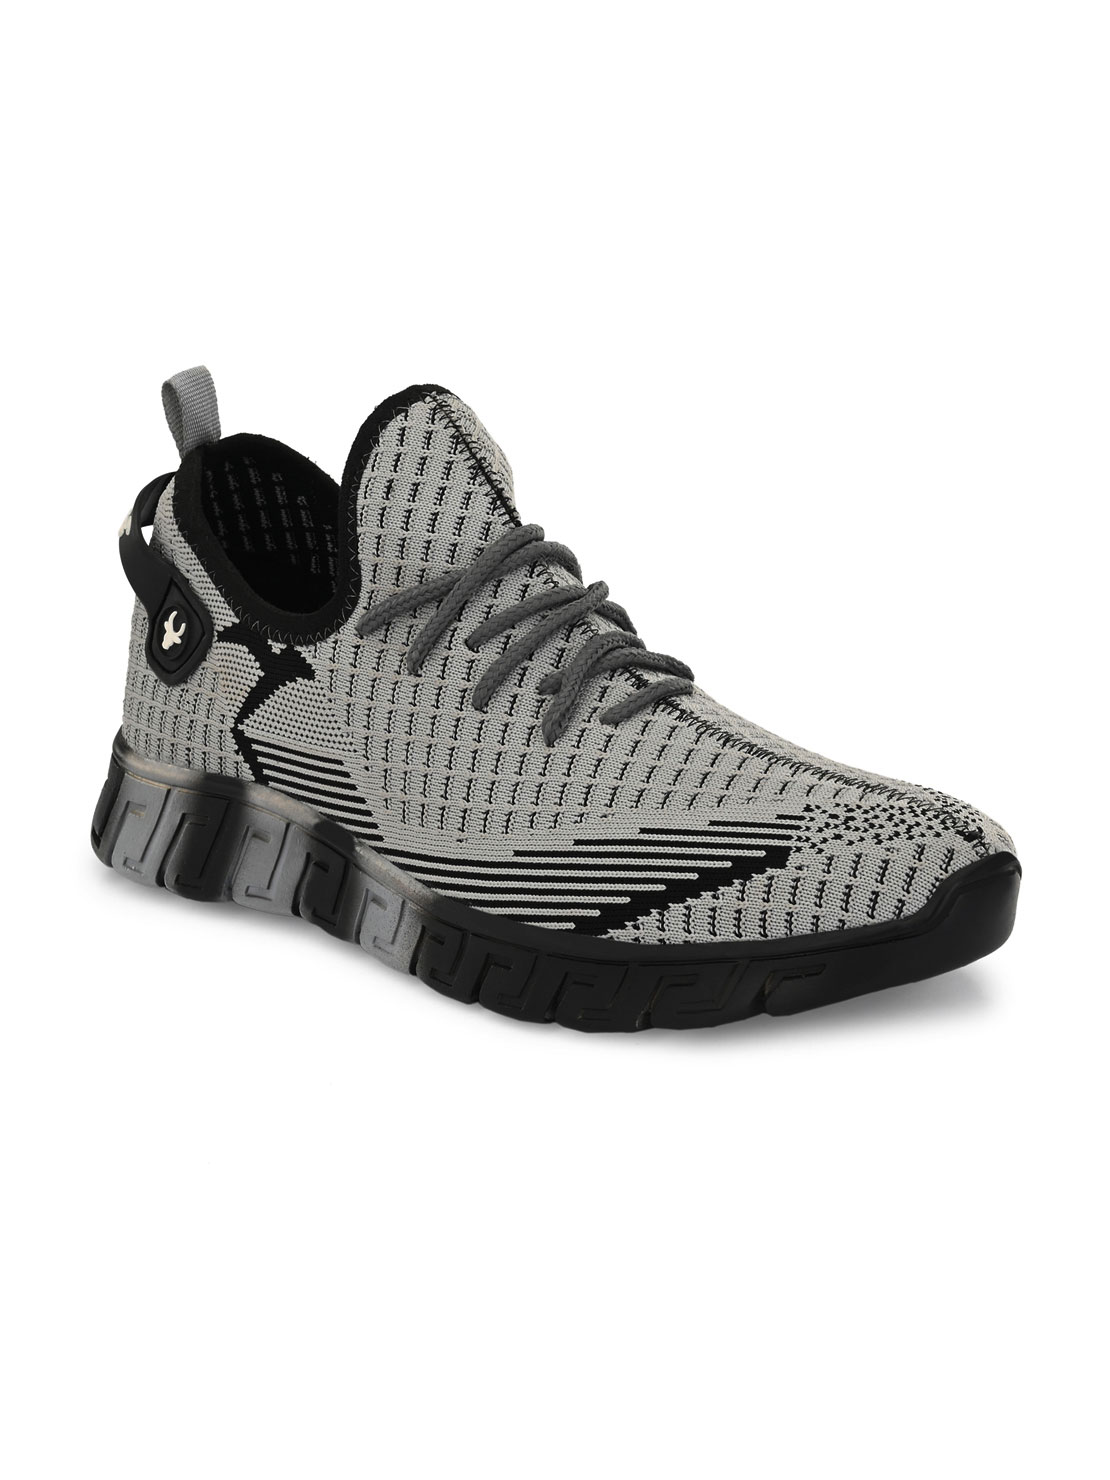 Hirolas   Hirolas® Men's Knitted athleisure Sports Shoes - Grey/Black